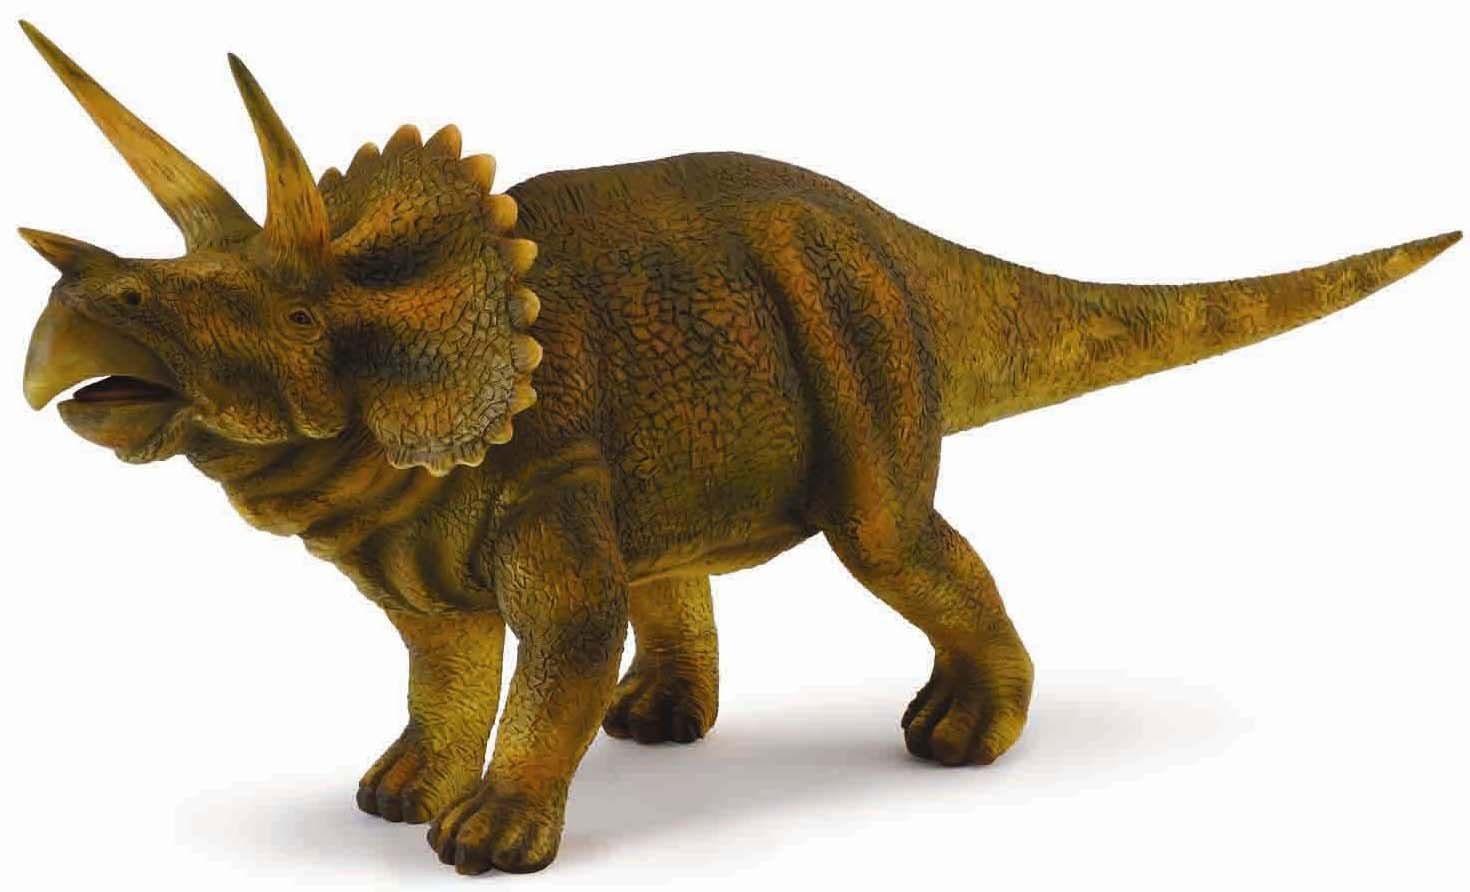 Dettato Sui Dinosauri Floriana La Prima Vegetariana